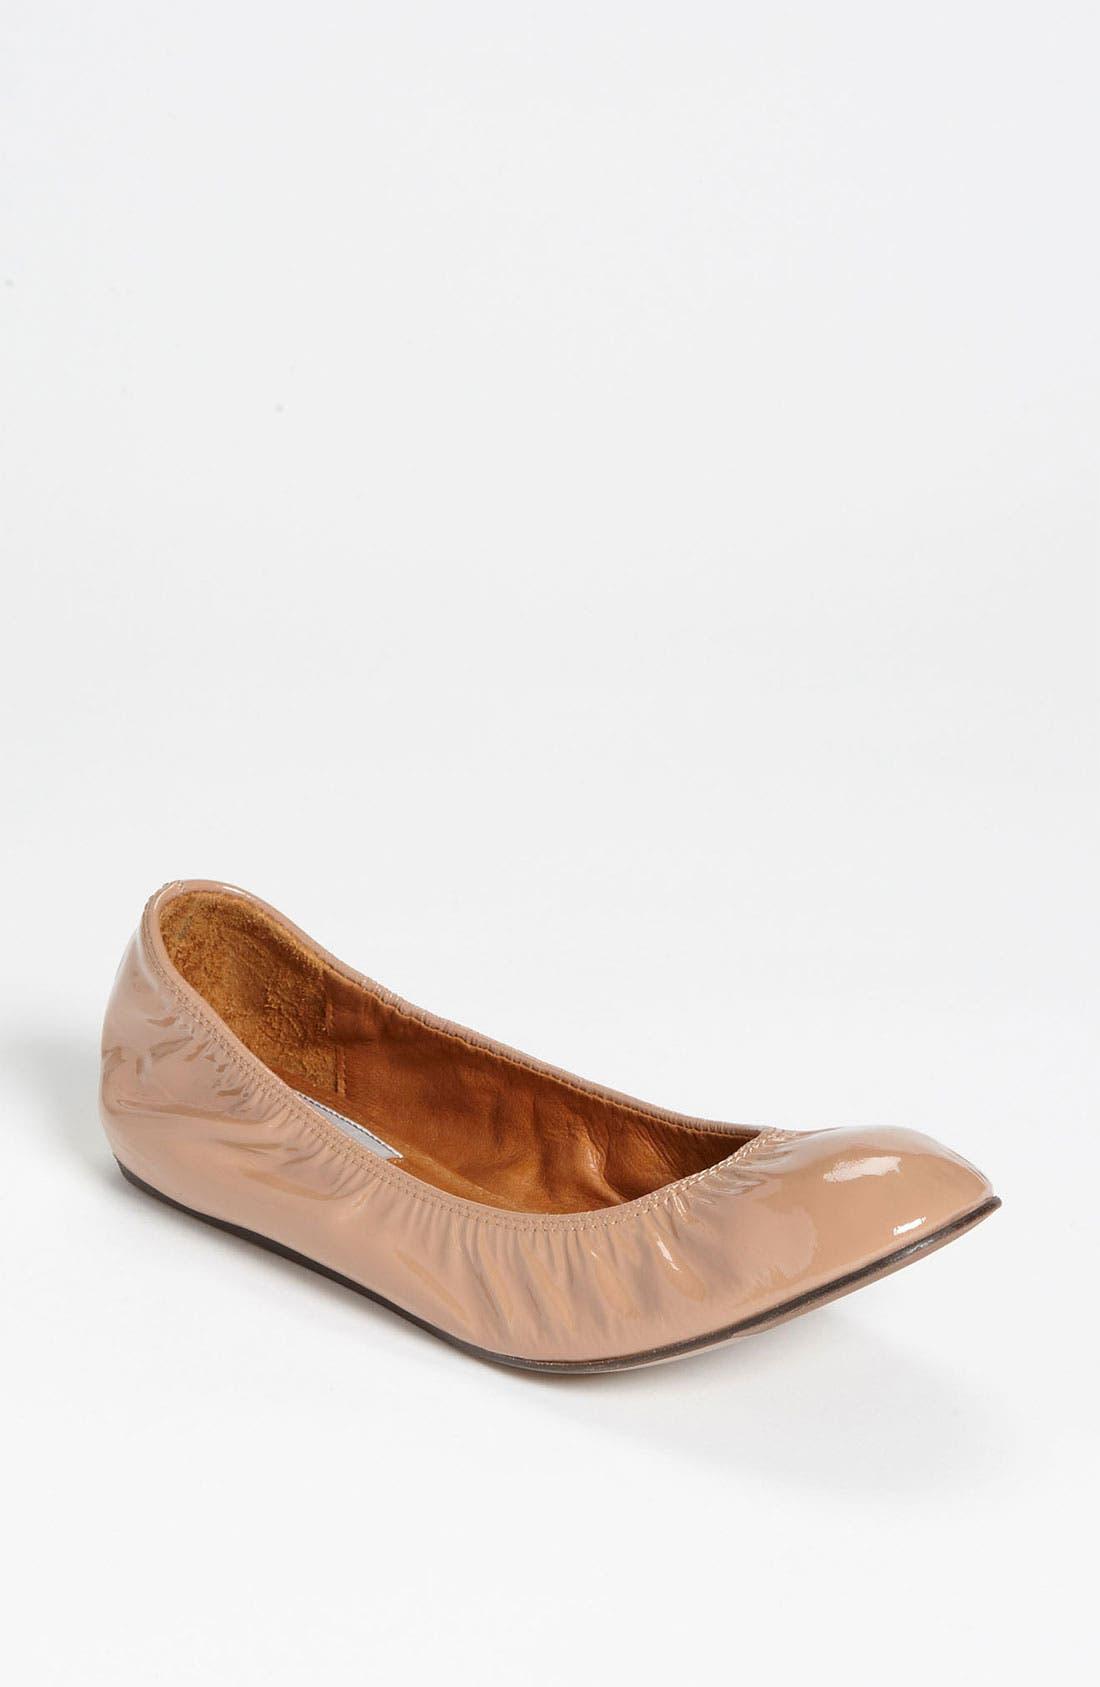 Main Image - Lanvin Patent Ballerina Flat